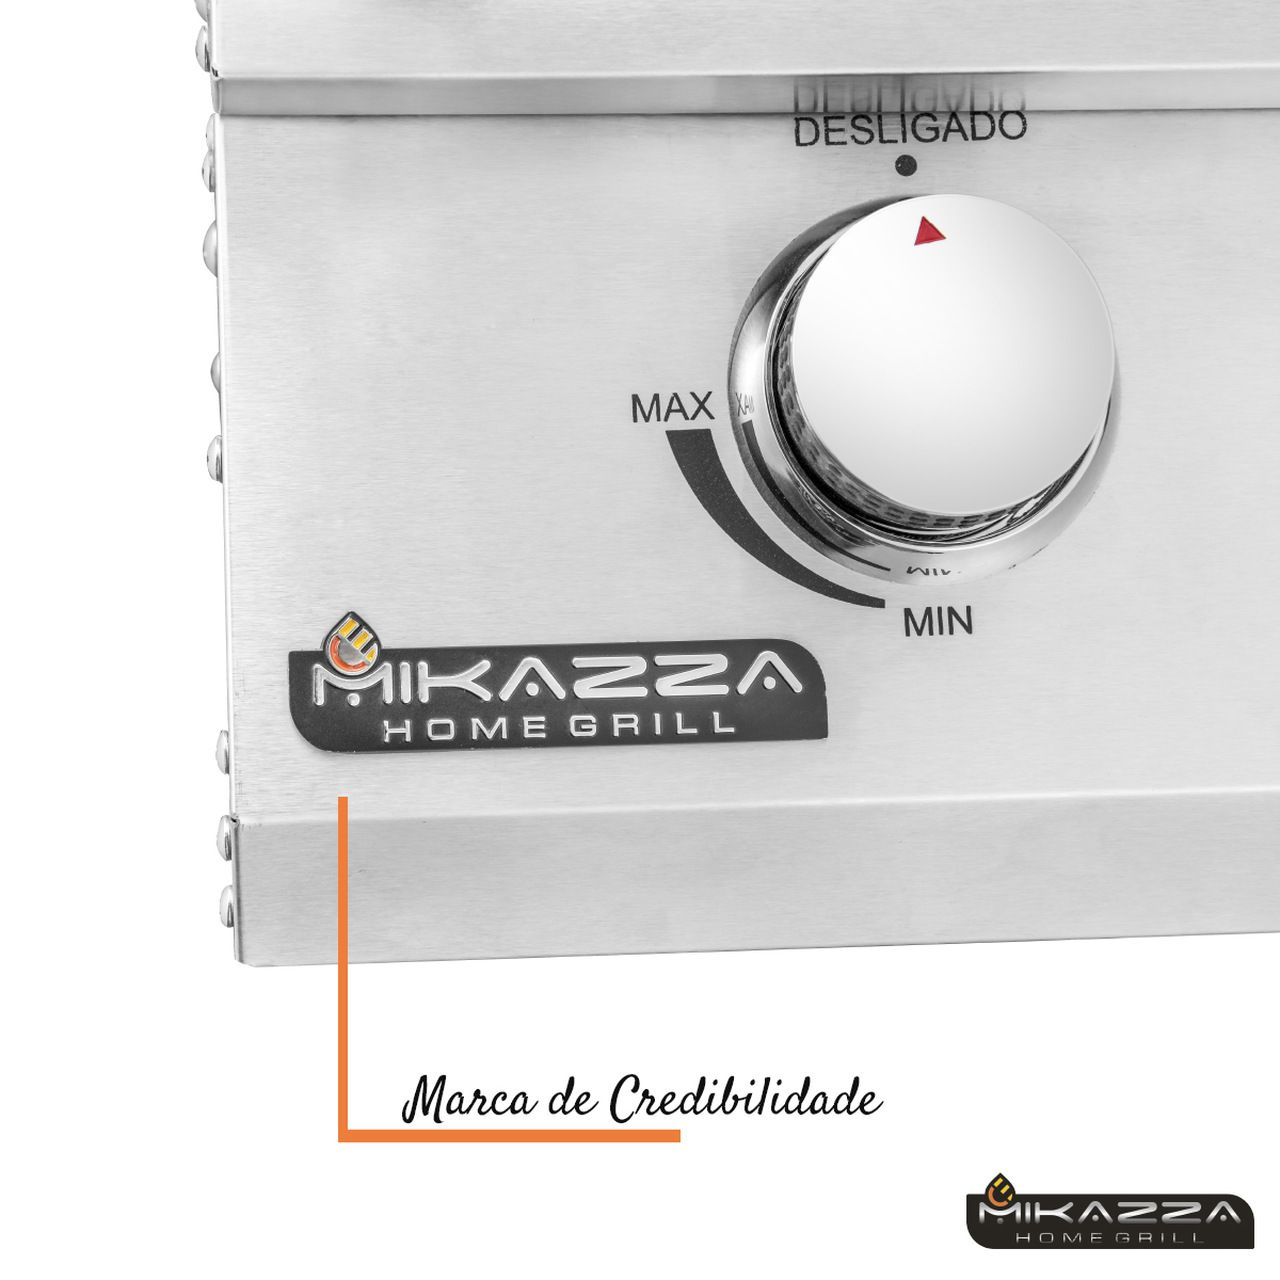 Churrasqueira à Gás Embutir Mikazza Pro 4 Combo + Chapa + Espeto Giratório + Boné